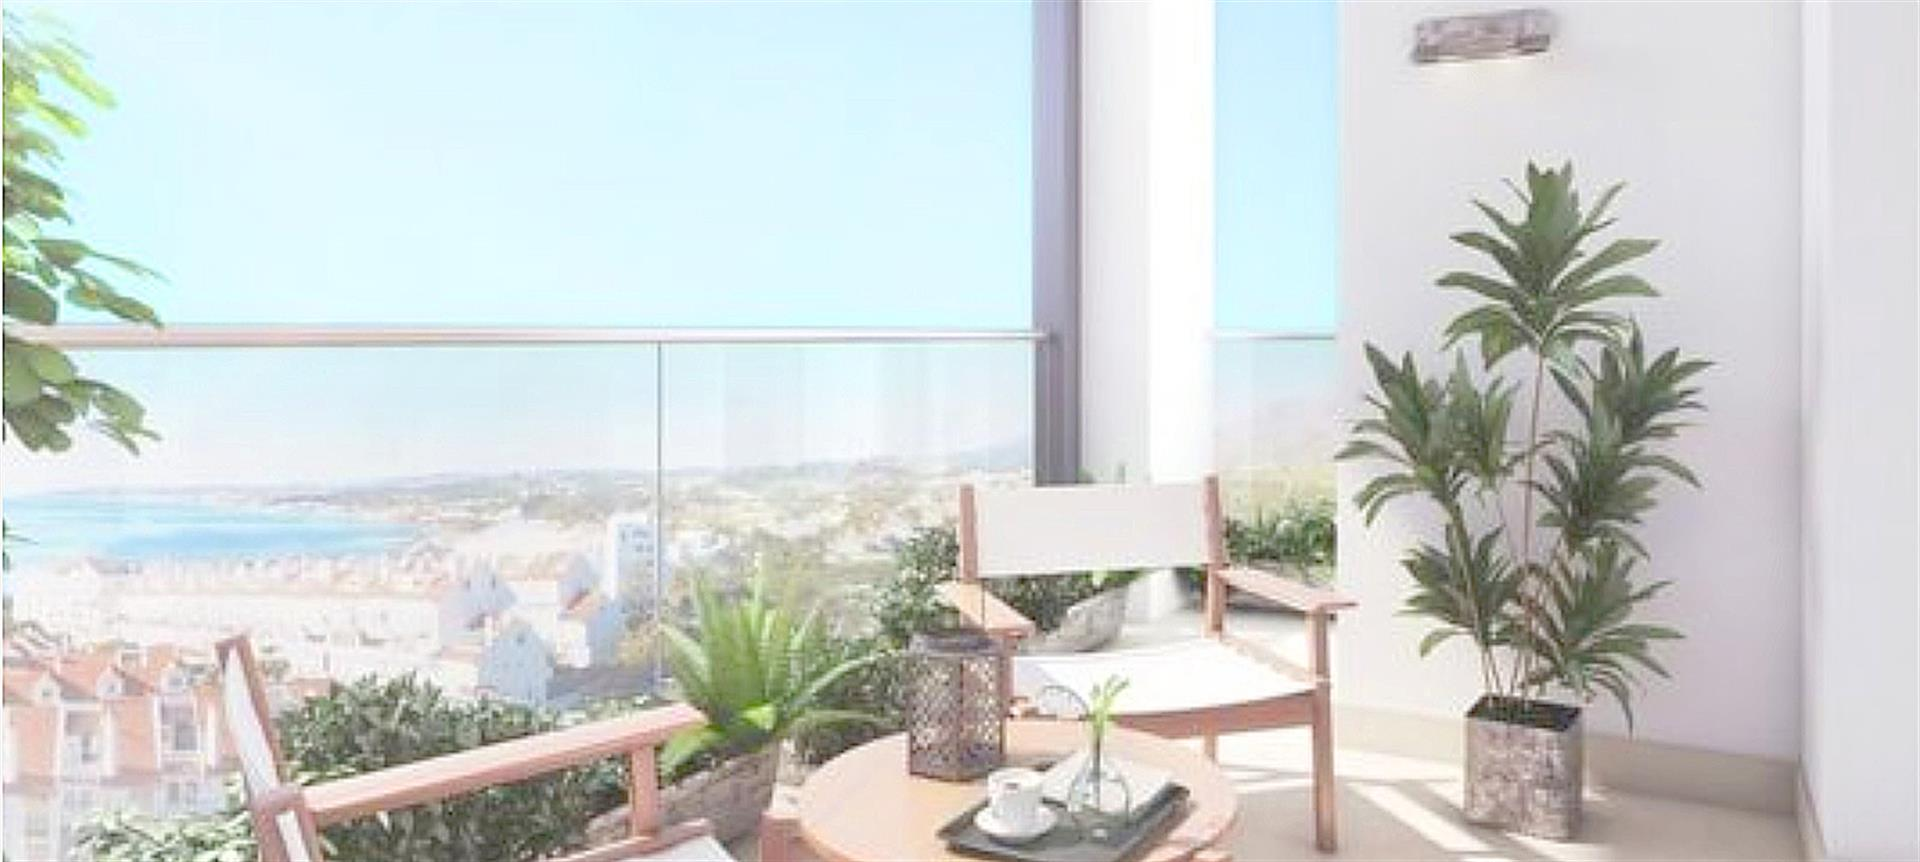 Apartments in Estepona MA2261899